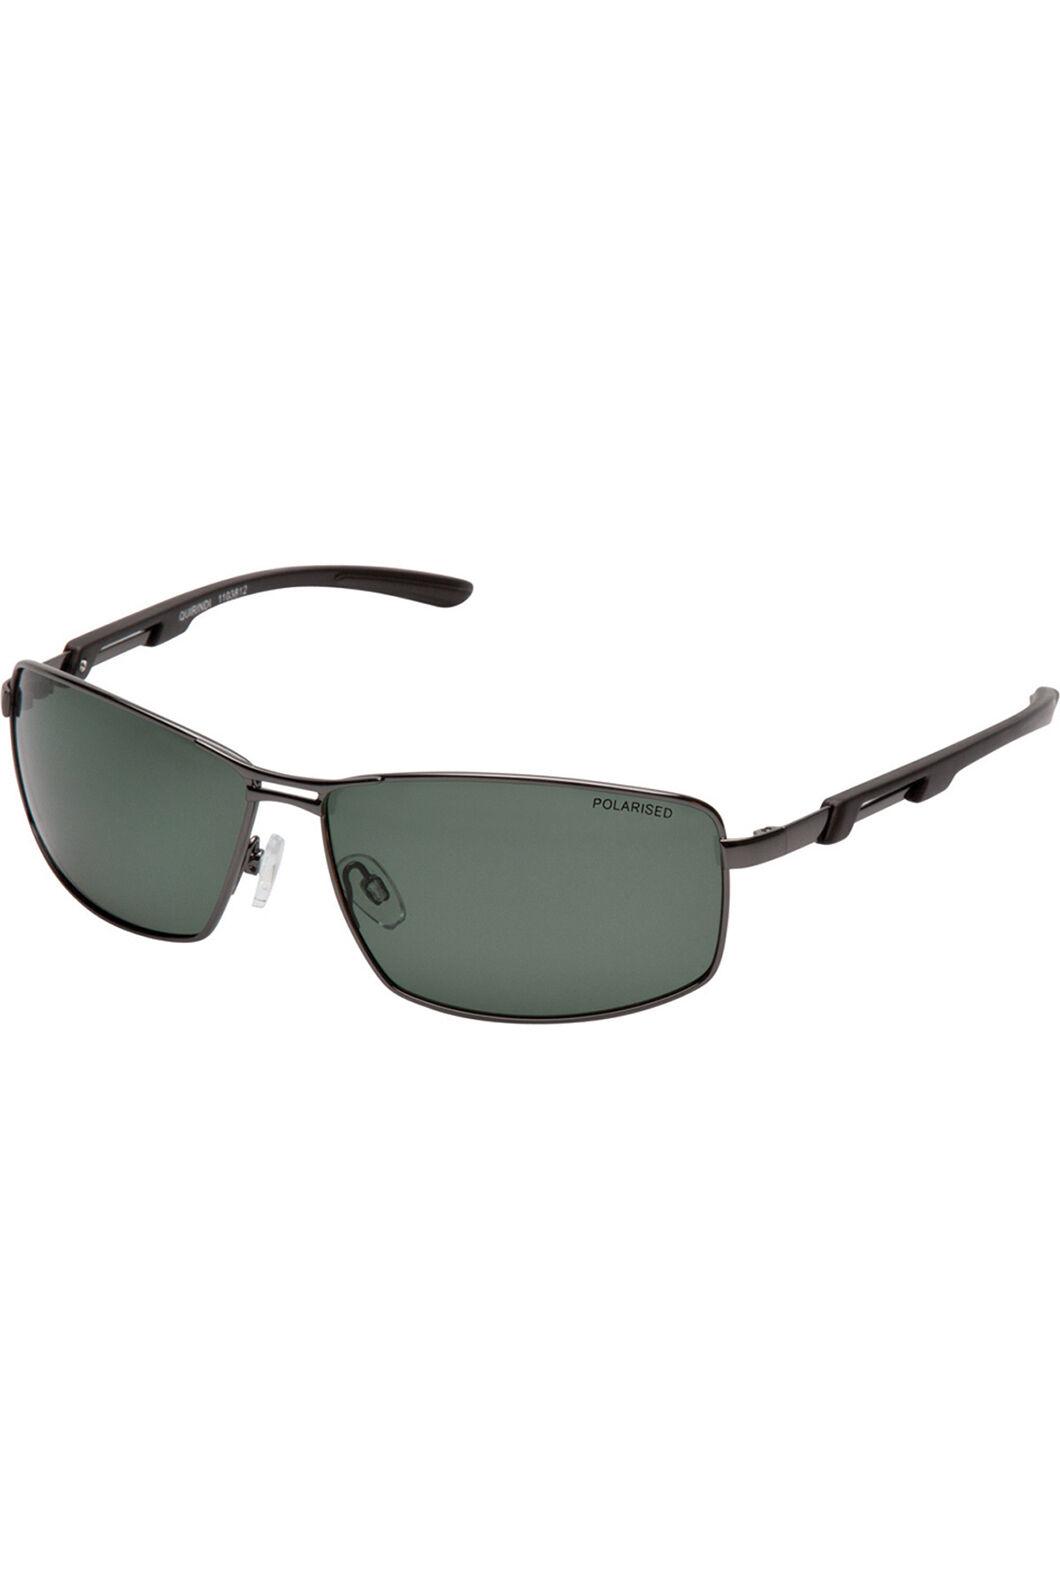 Cancer Council Unisex Quirindi Sunglasses, Gunmetal, hi-res